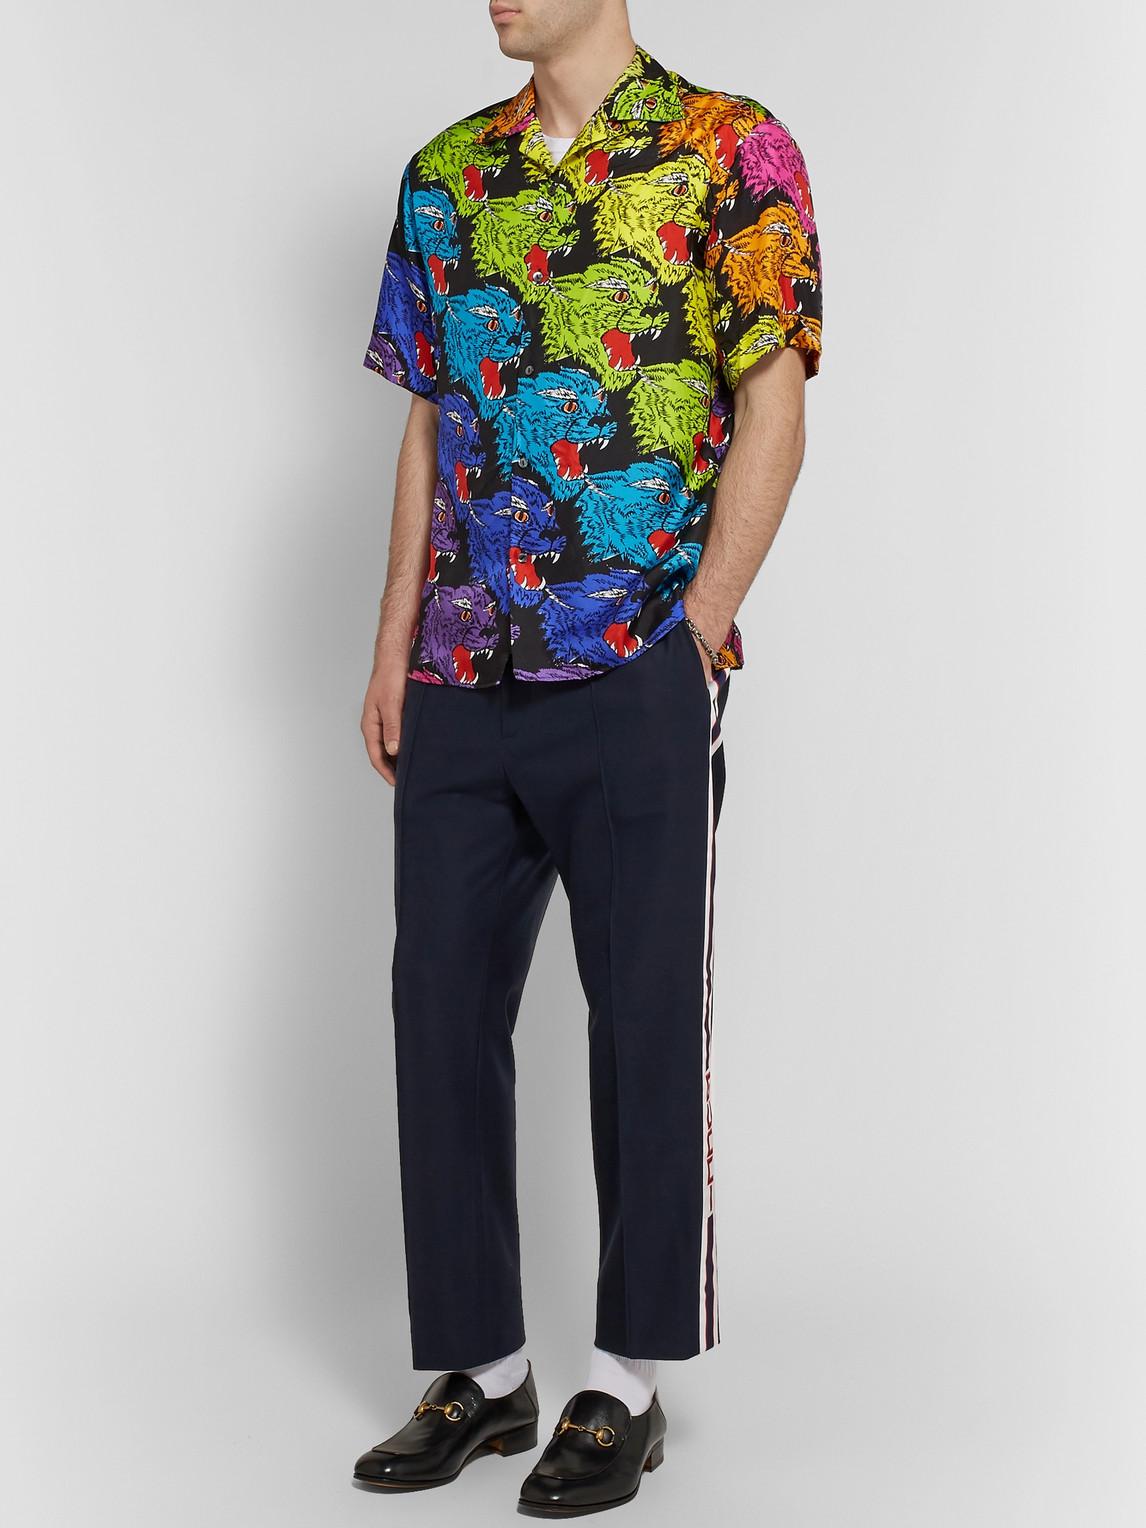 Gucci Pants SLIM-FIT CROPPED WEBBING-TRIMMED COTTON-PIQUÉ DRAWSTRING TROUSERS